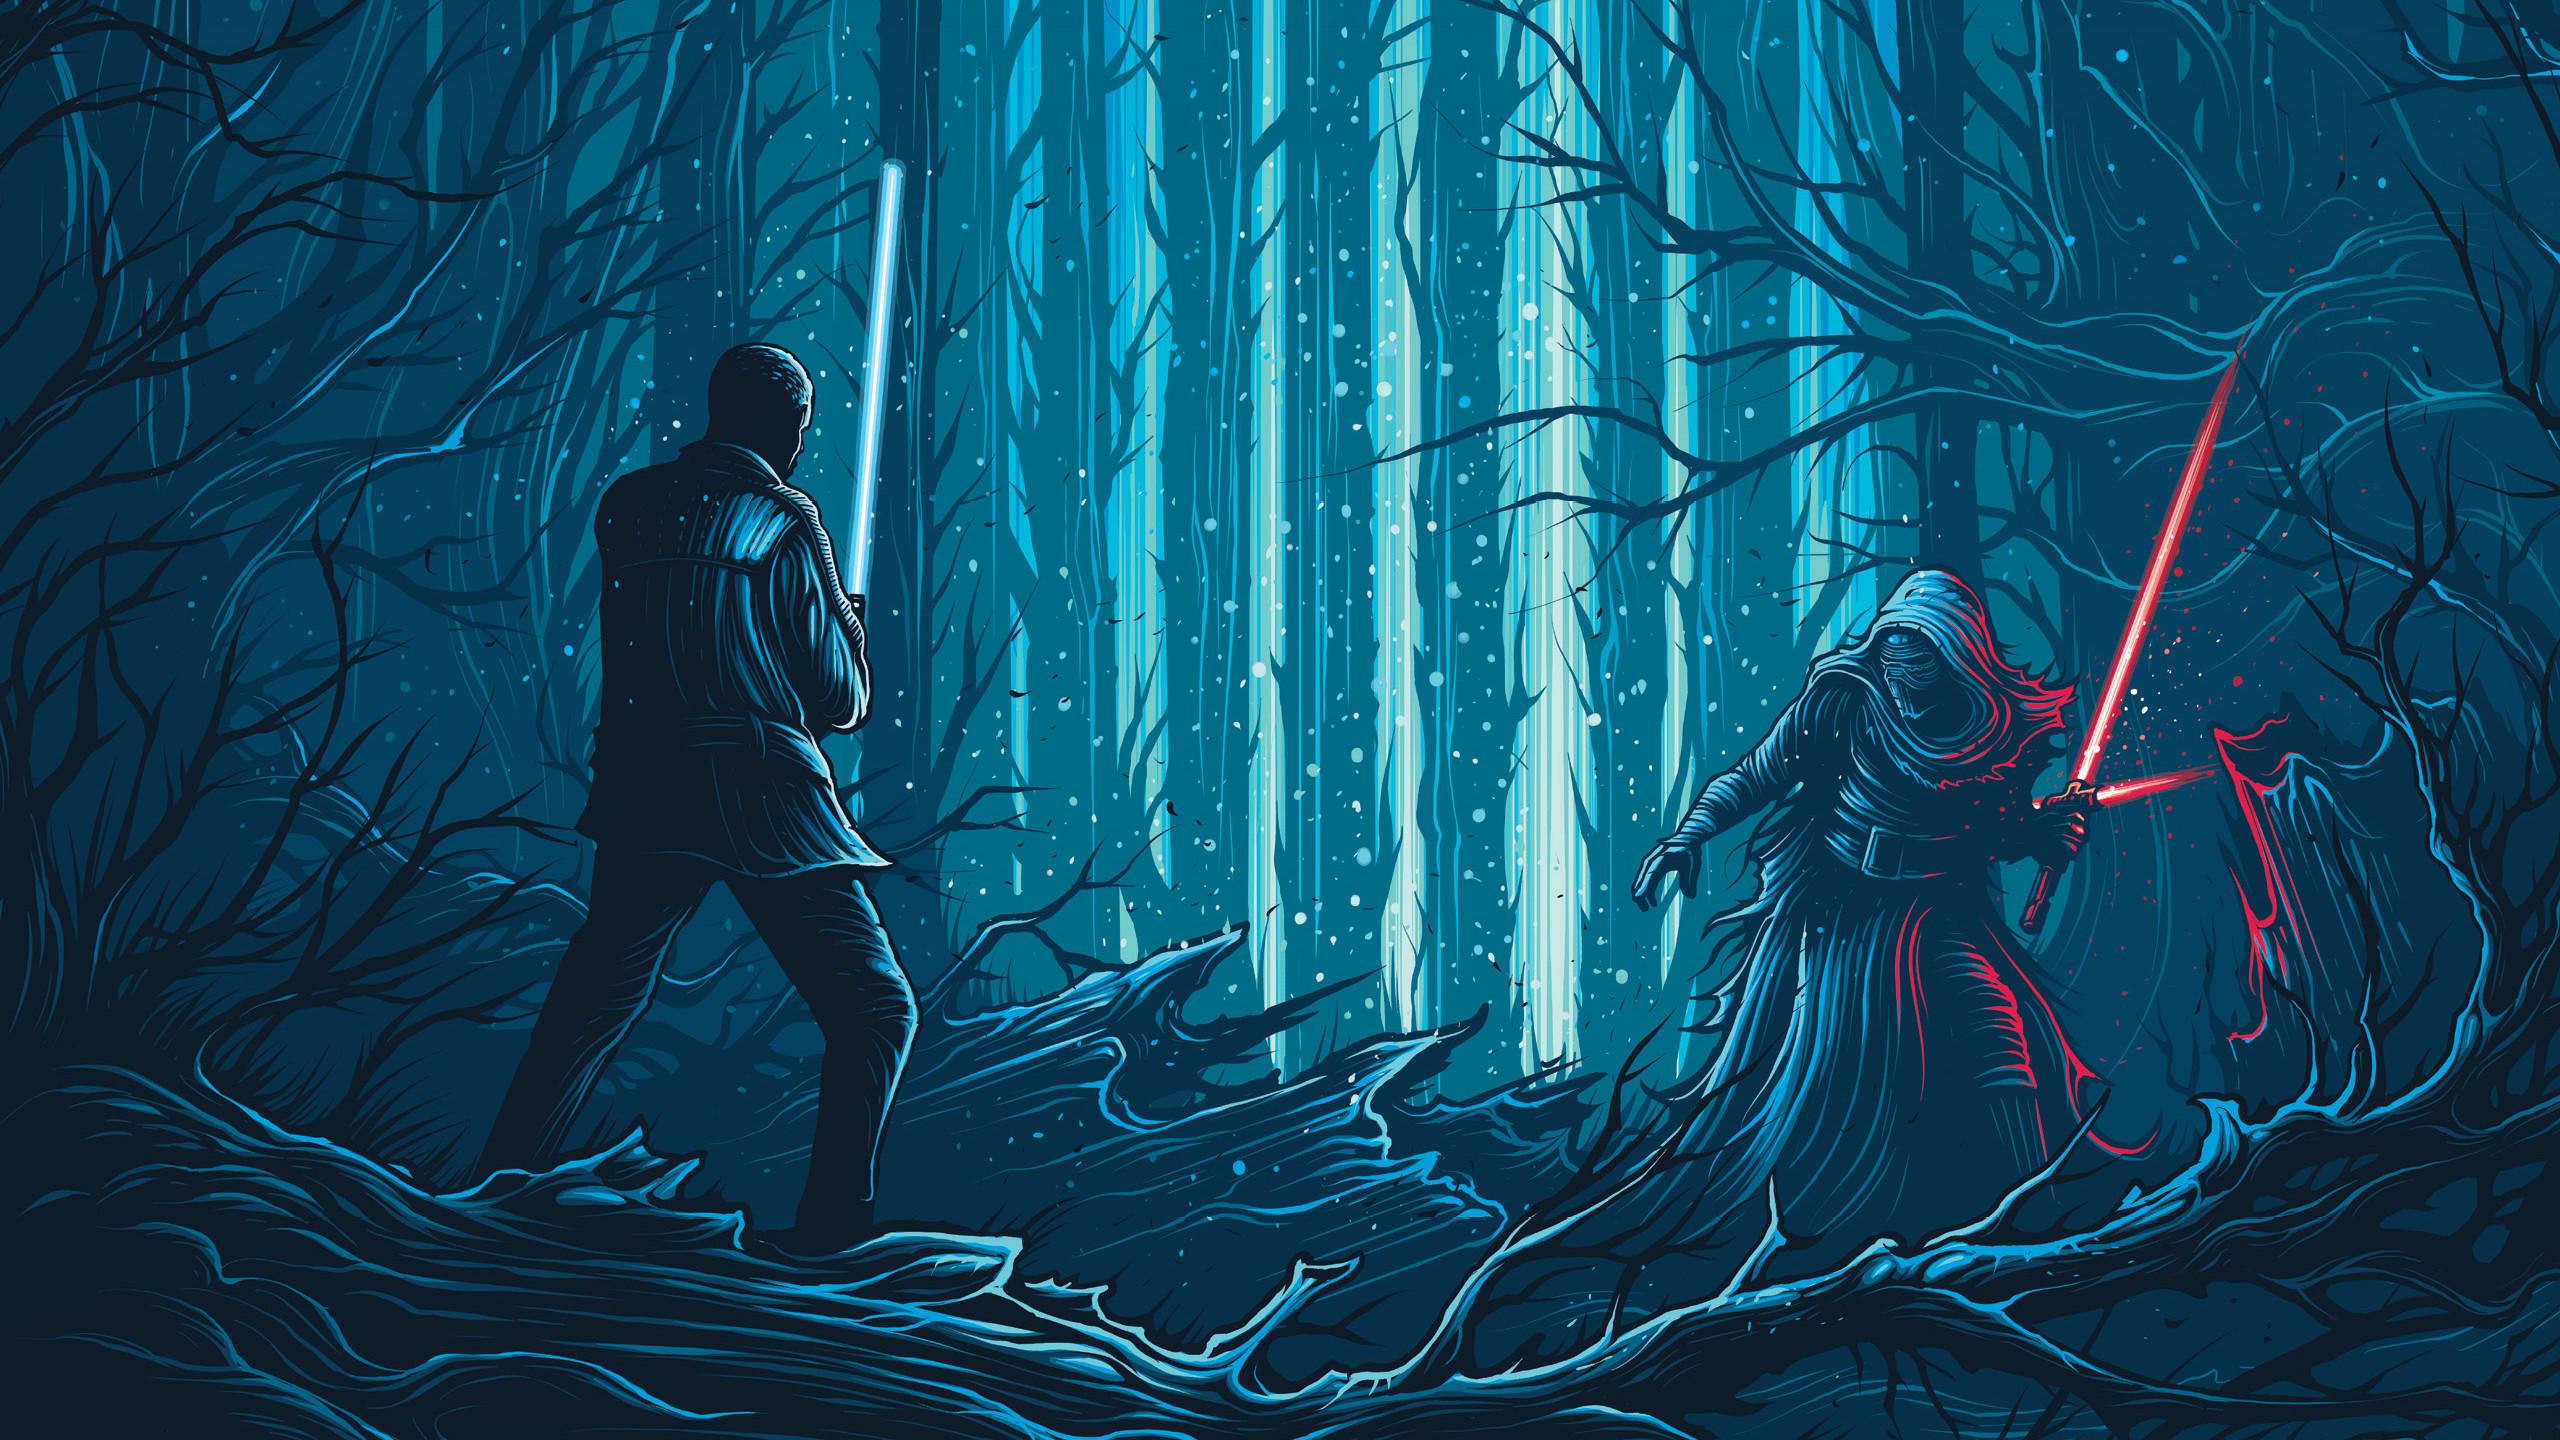 Star Wars – Wallpaper for Mac